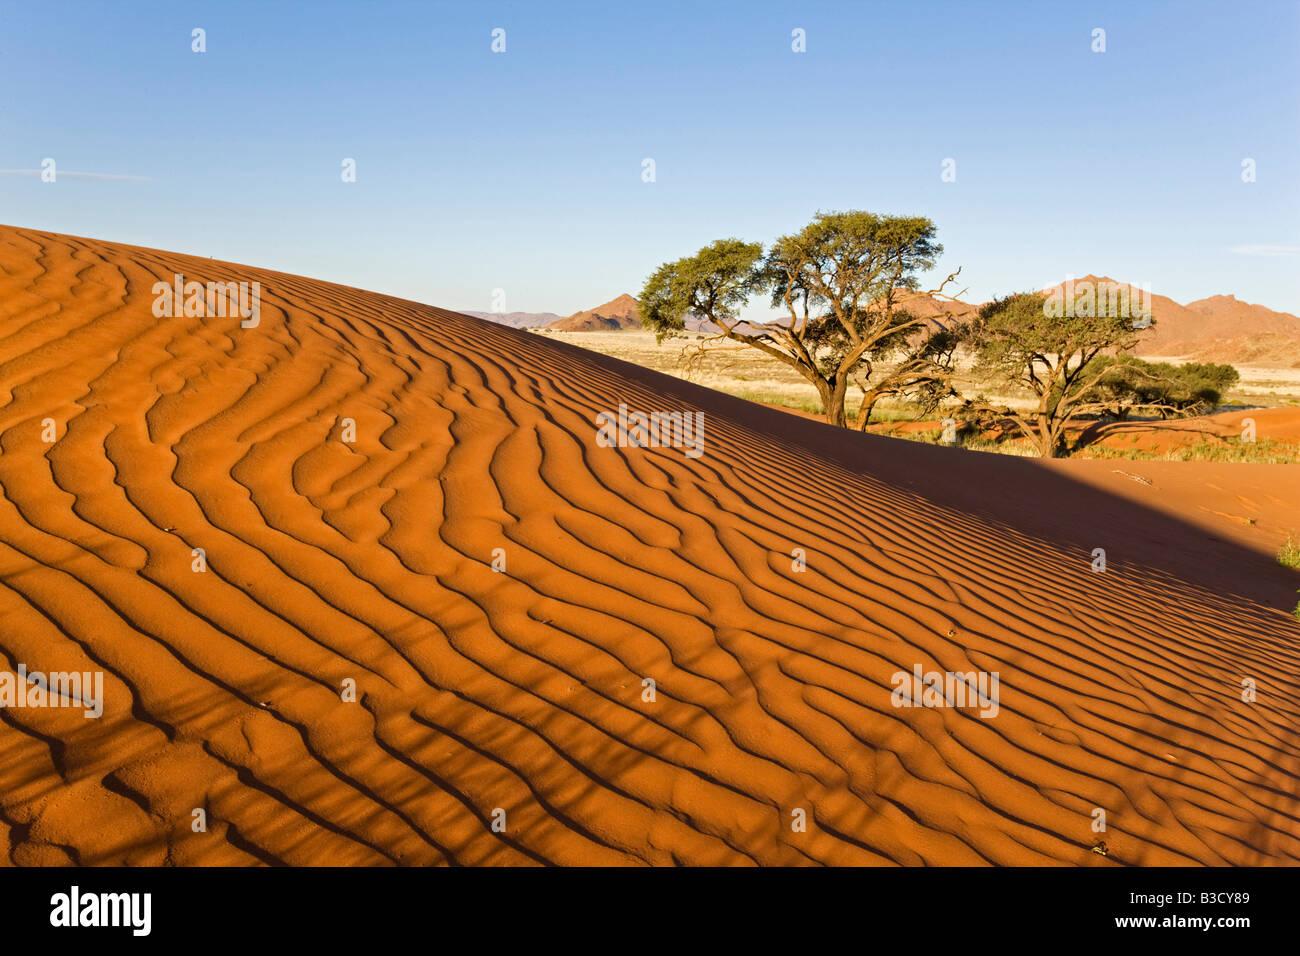 Afrika, Namibia, Namib-Wüste-Düne und Baum Stockbild